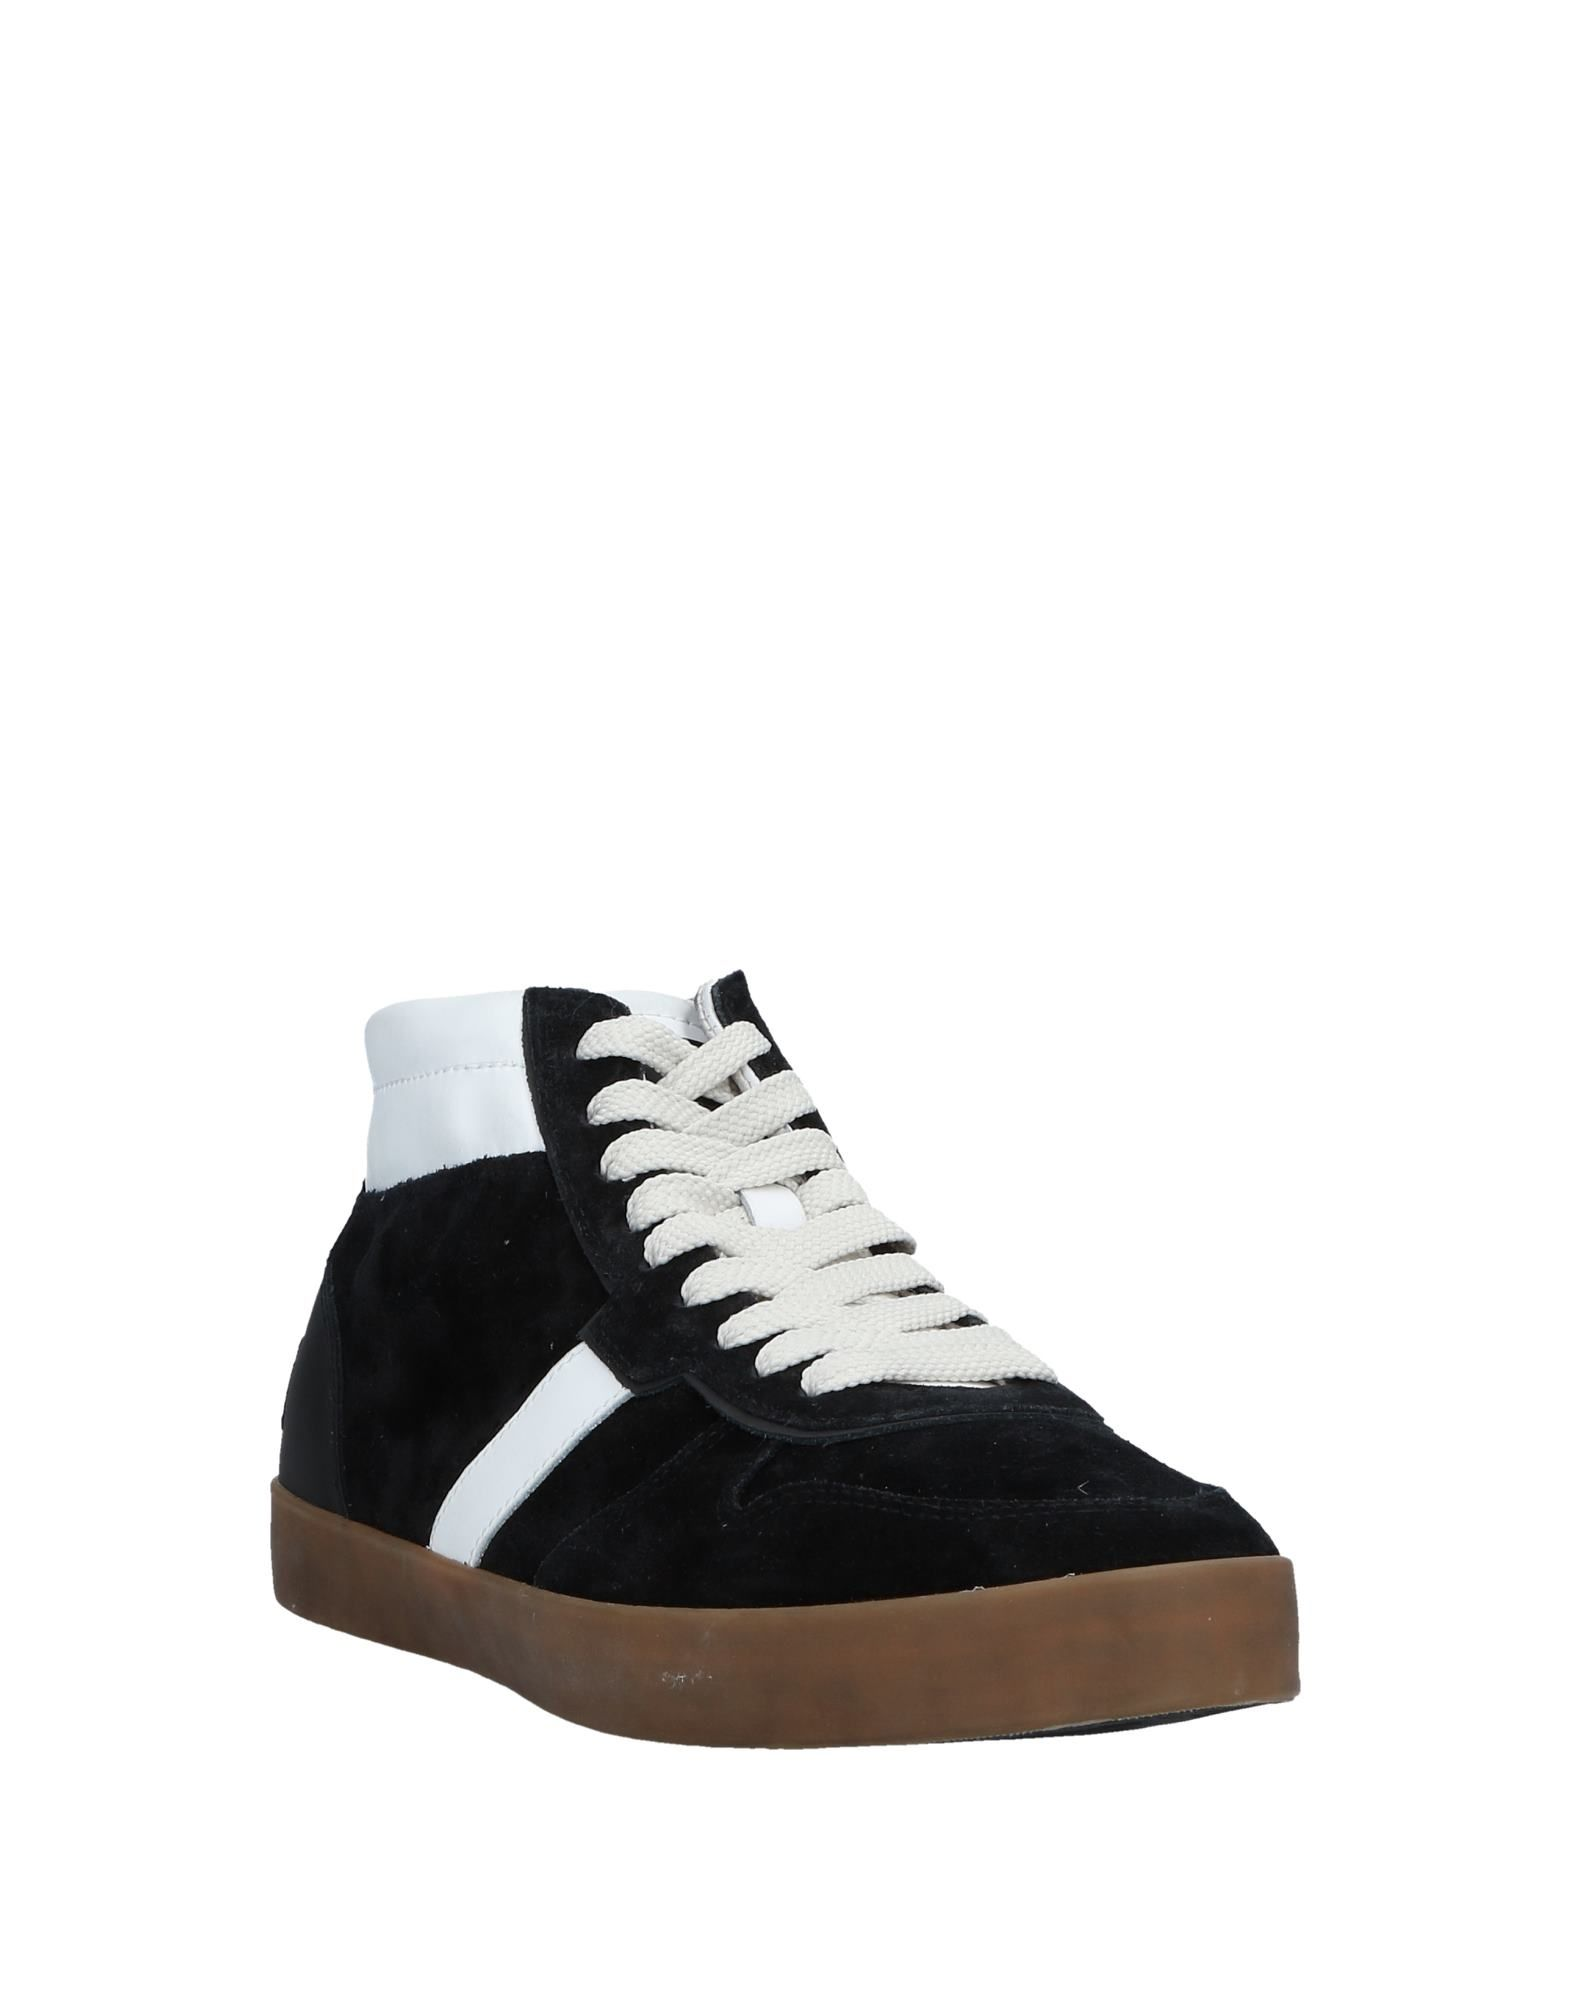 Rabatt echte  Schuhe D.A.T.E. Sneakers Herren  echte 11535322PT c57dee